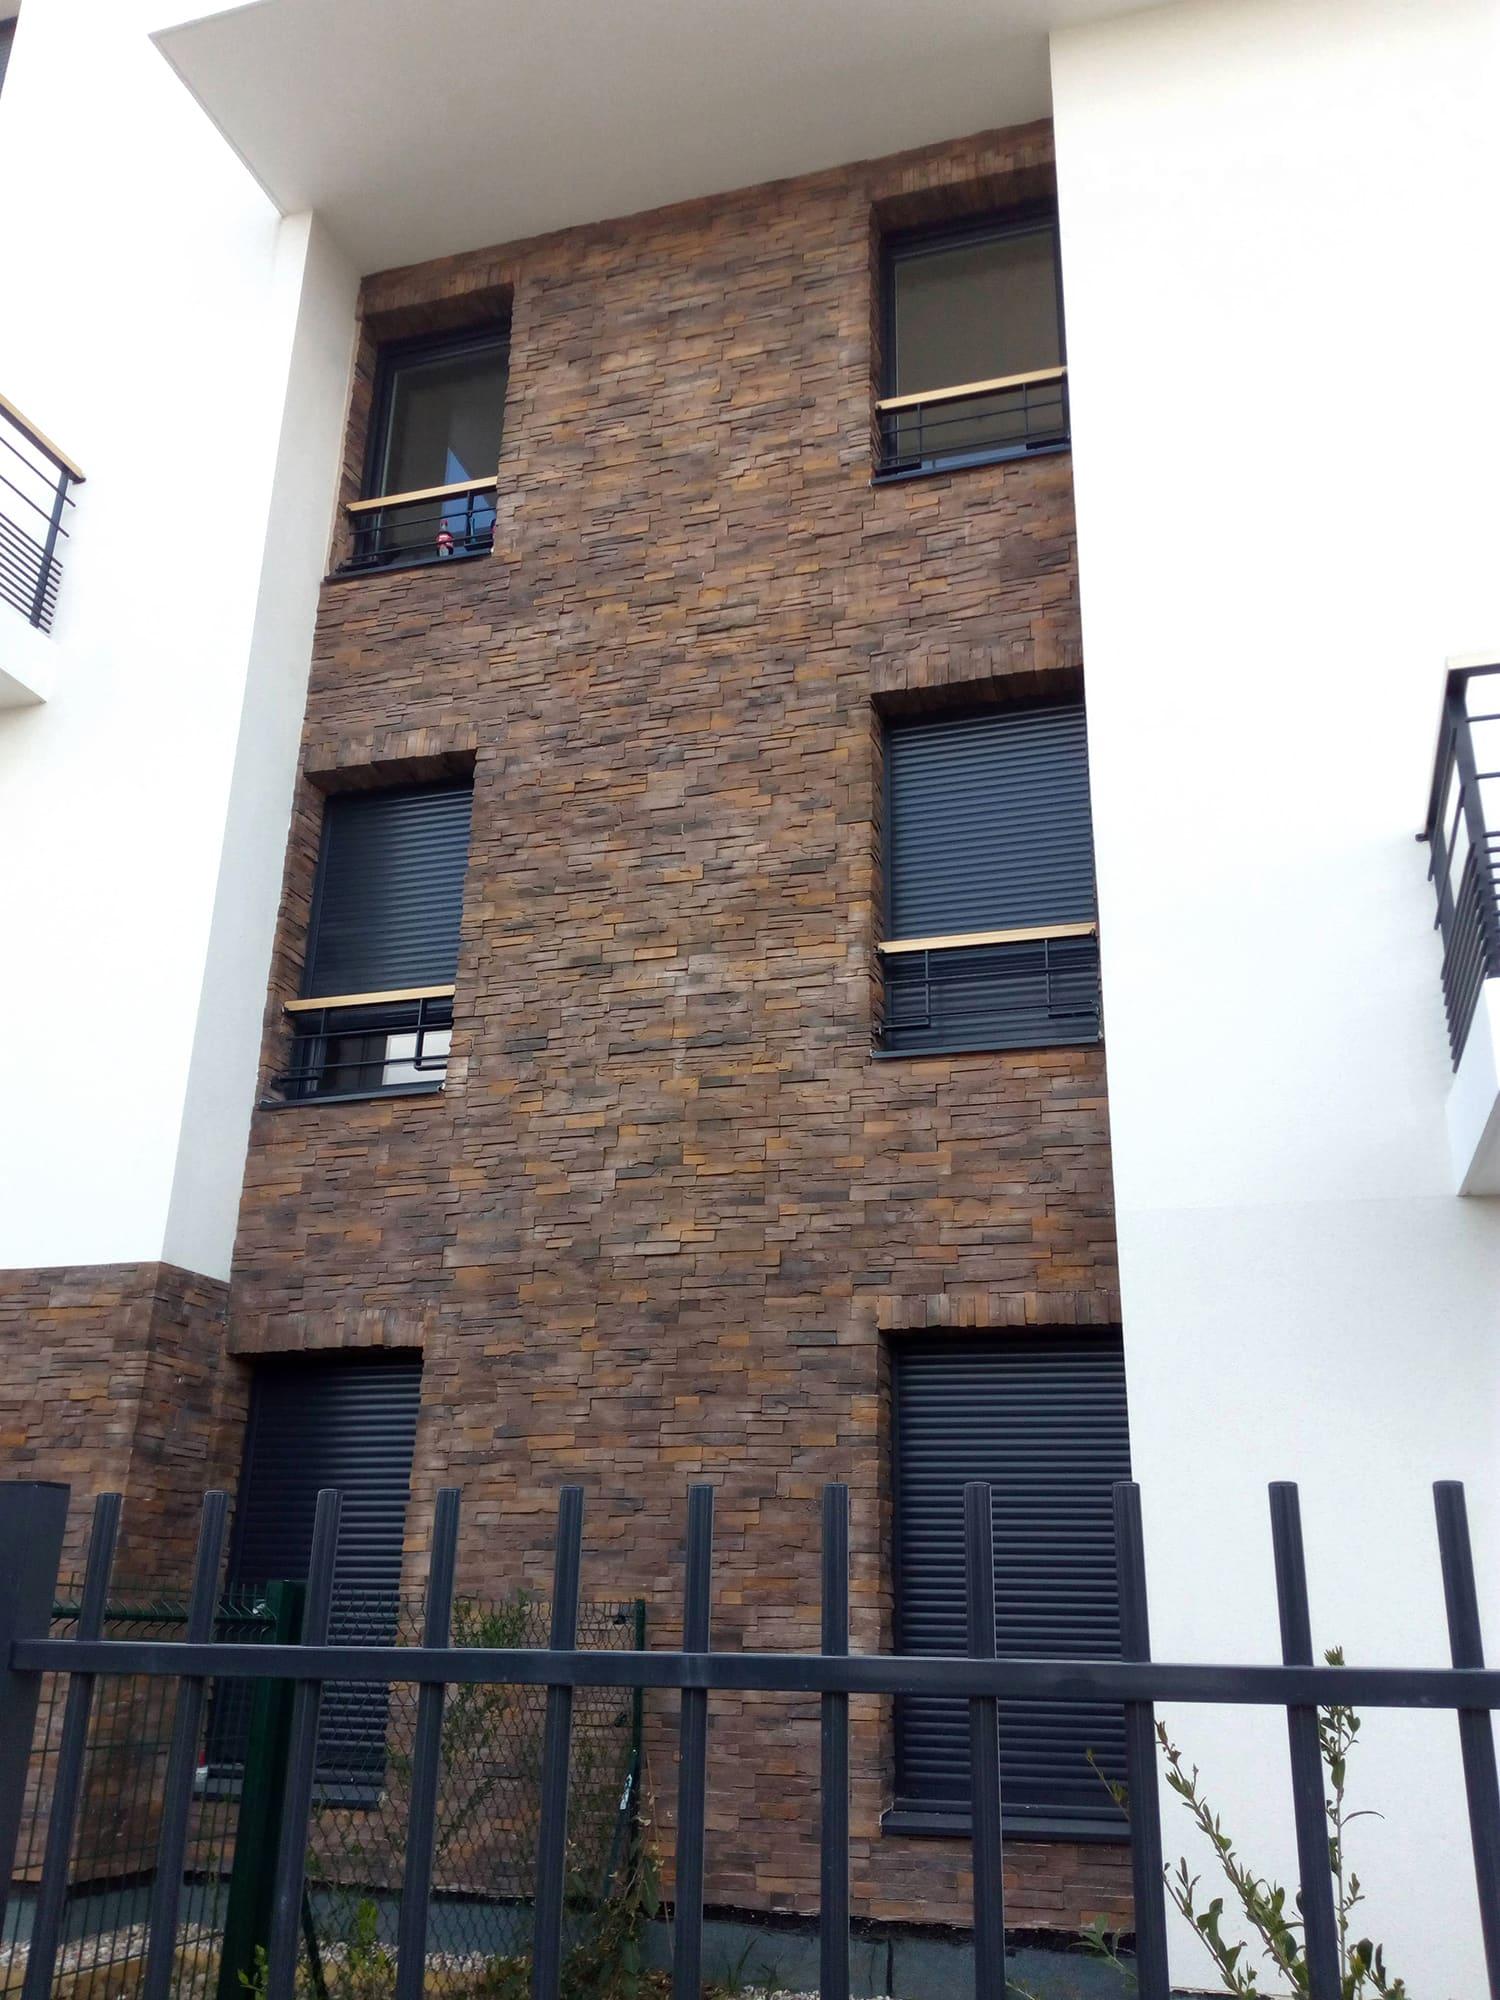 Private building